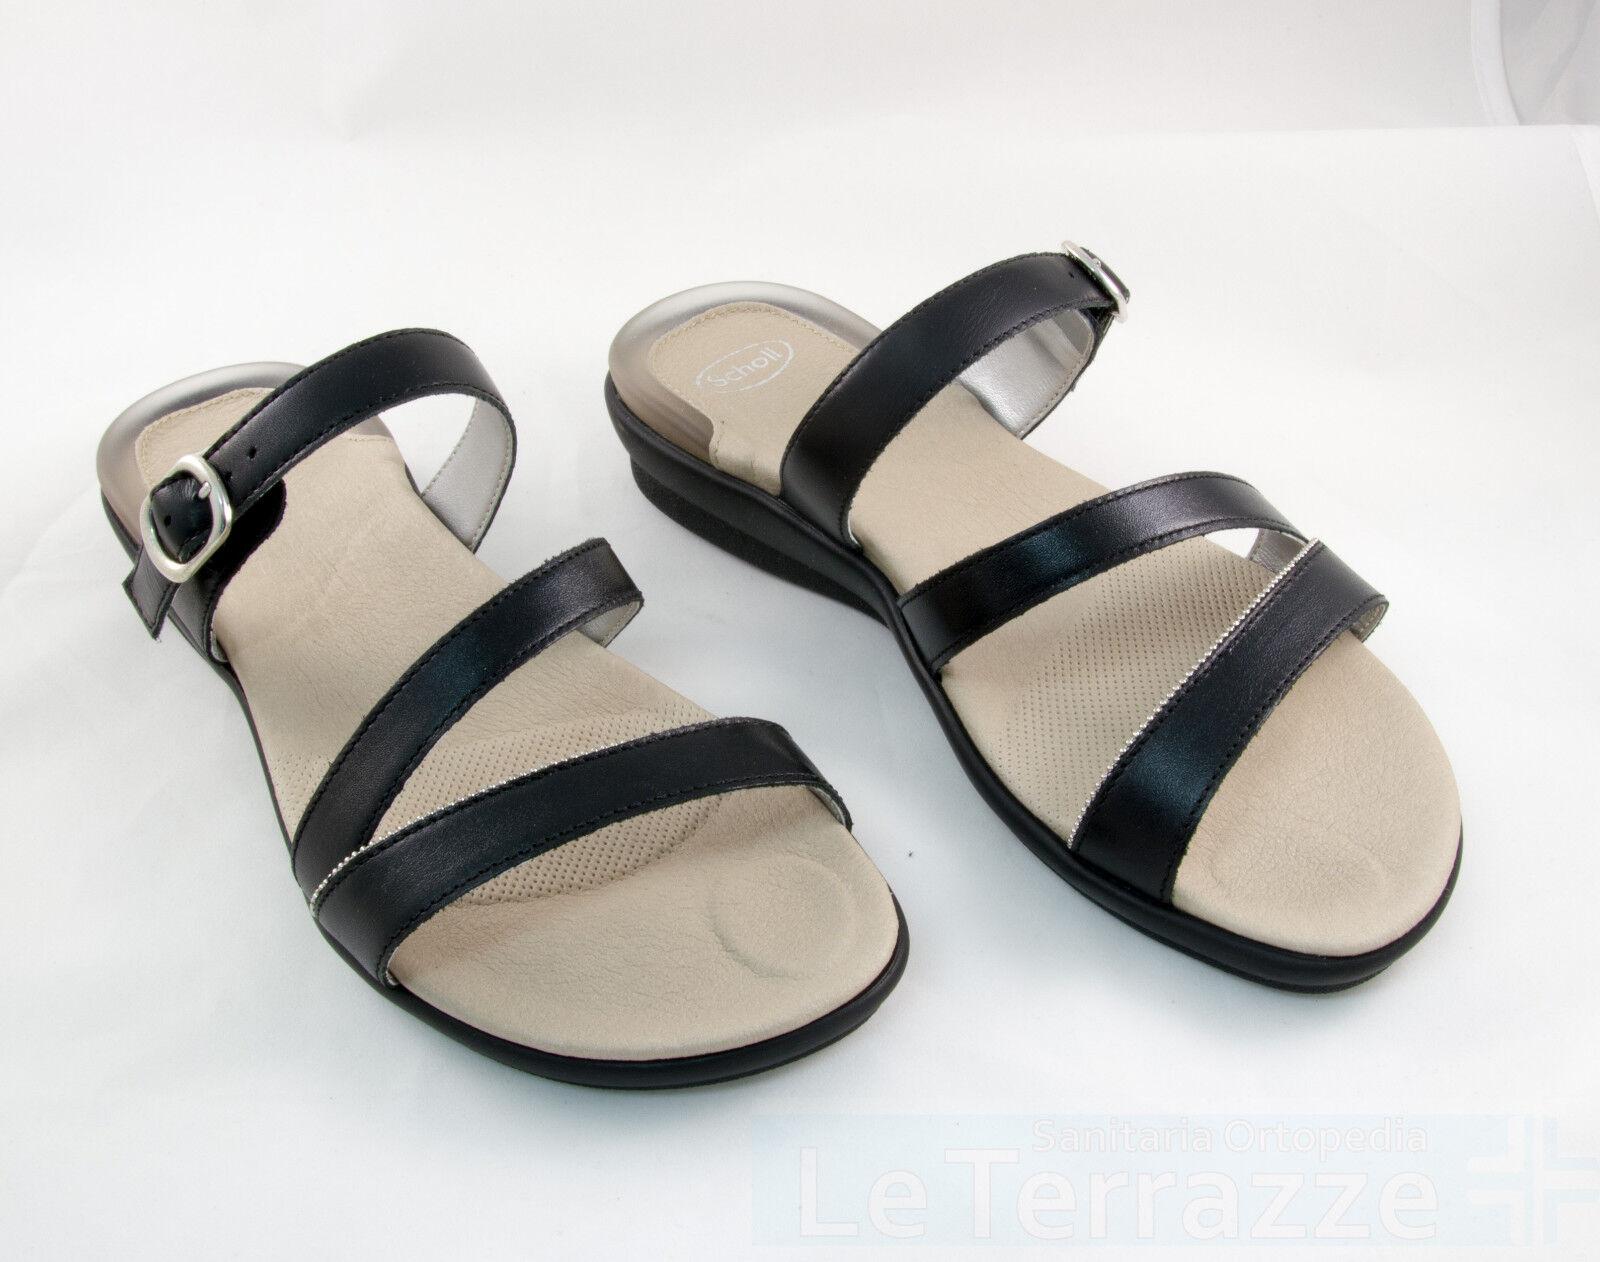 Dr Scholl Elinor pantofole Gelactive ciabatte pantofole Elinor zoccoli scarpe f3098d